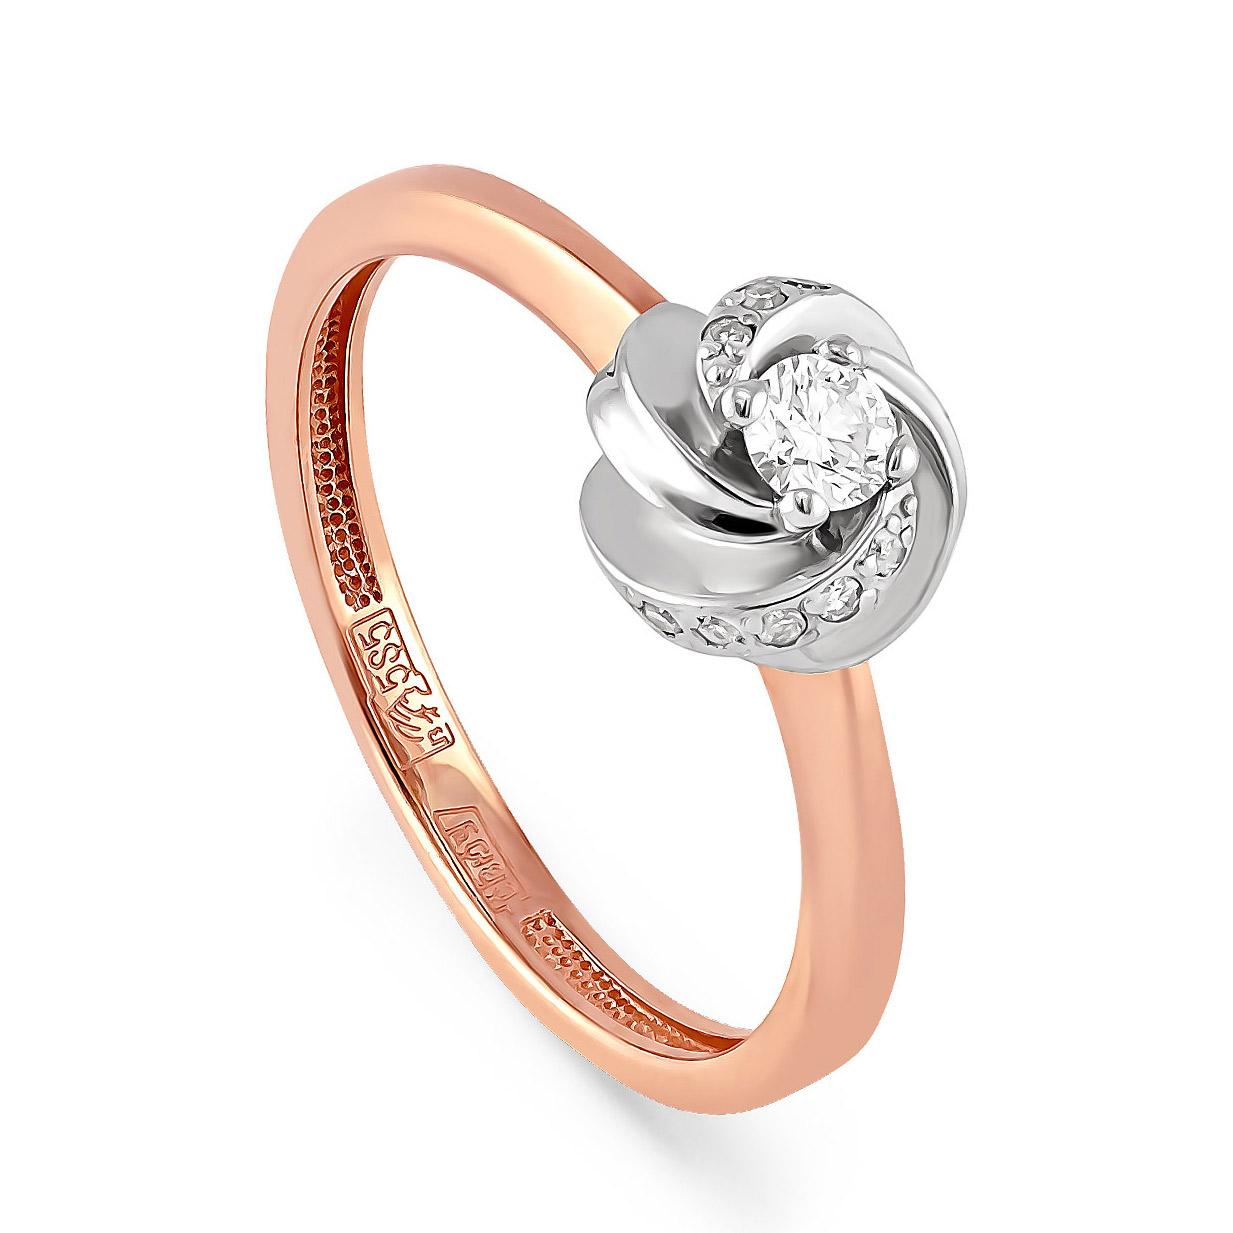 Золотое кольцо Бриллиант арт. 11-0632 11-0632